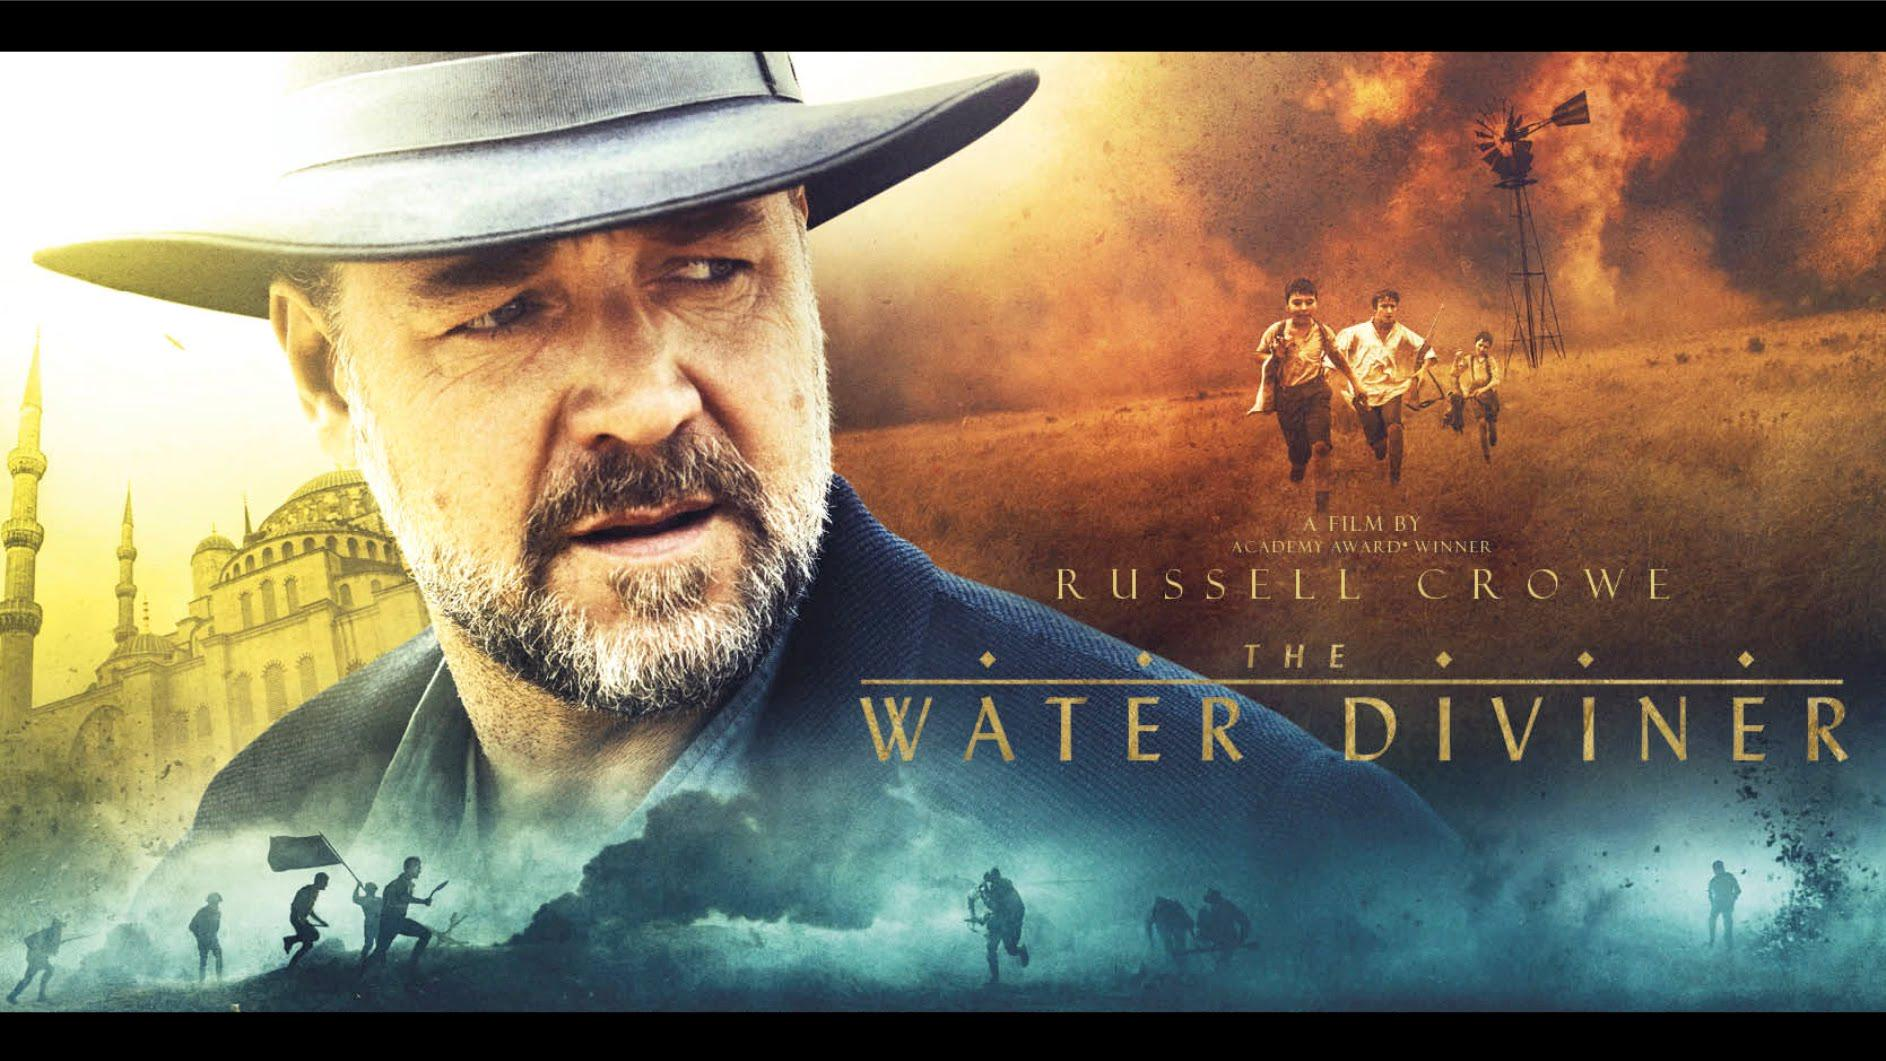 RT @veteranfilmfest: Must see film #TheWaterDiviner @RatPacEnt @ratpacpress @eOneANZ @russellcrowe @eOneANZ http://t.co/Tzagz2roX9